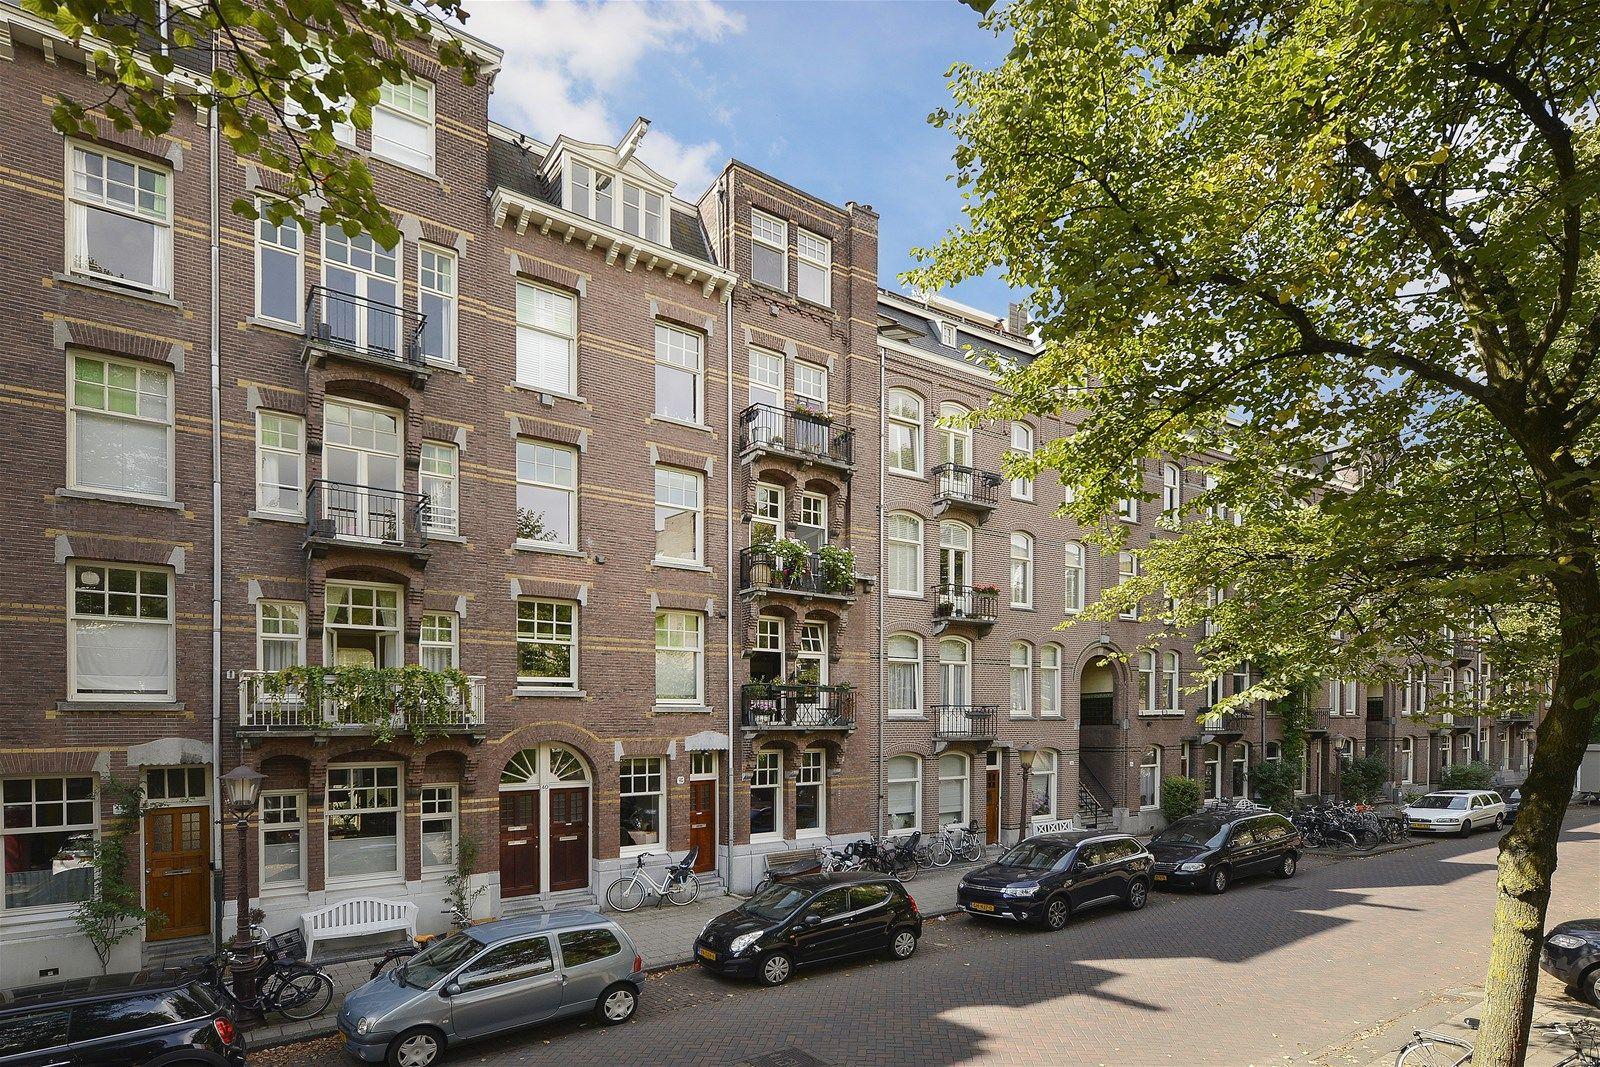 Saxen-Weimarlaan 40hs, Amsterdam